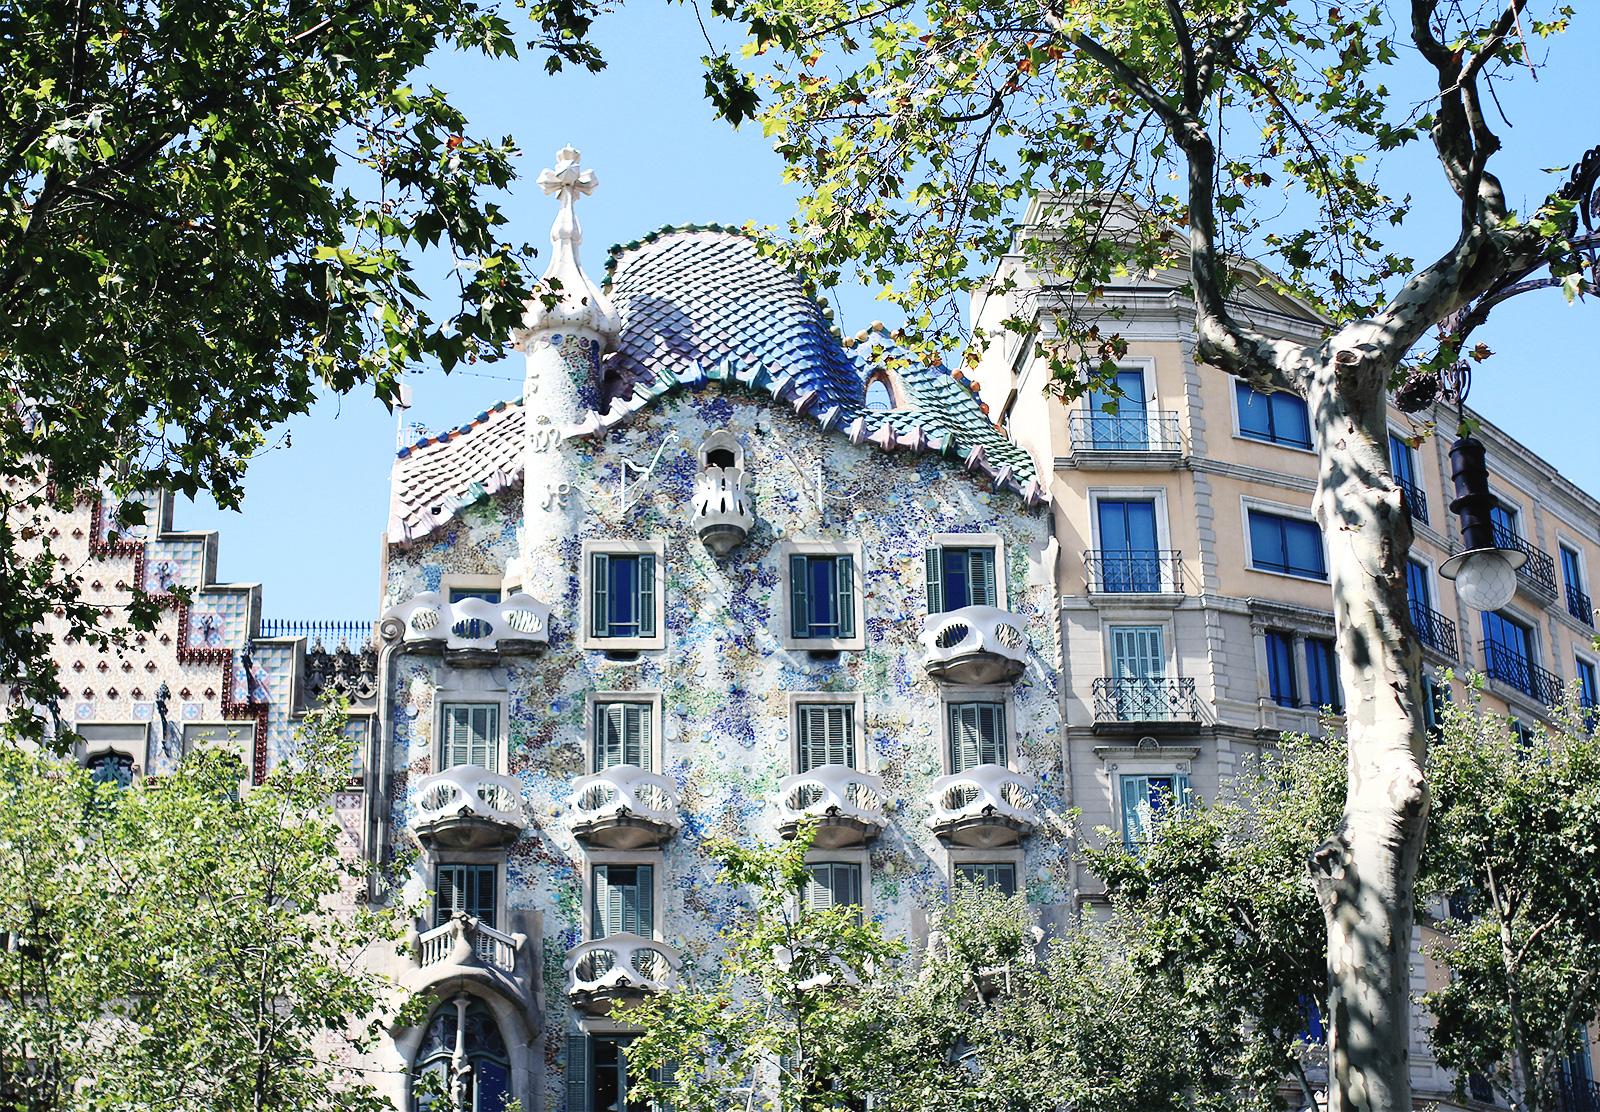 barcelona-juli-02-01